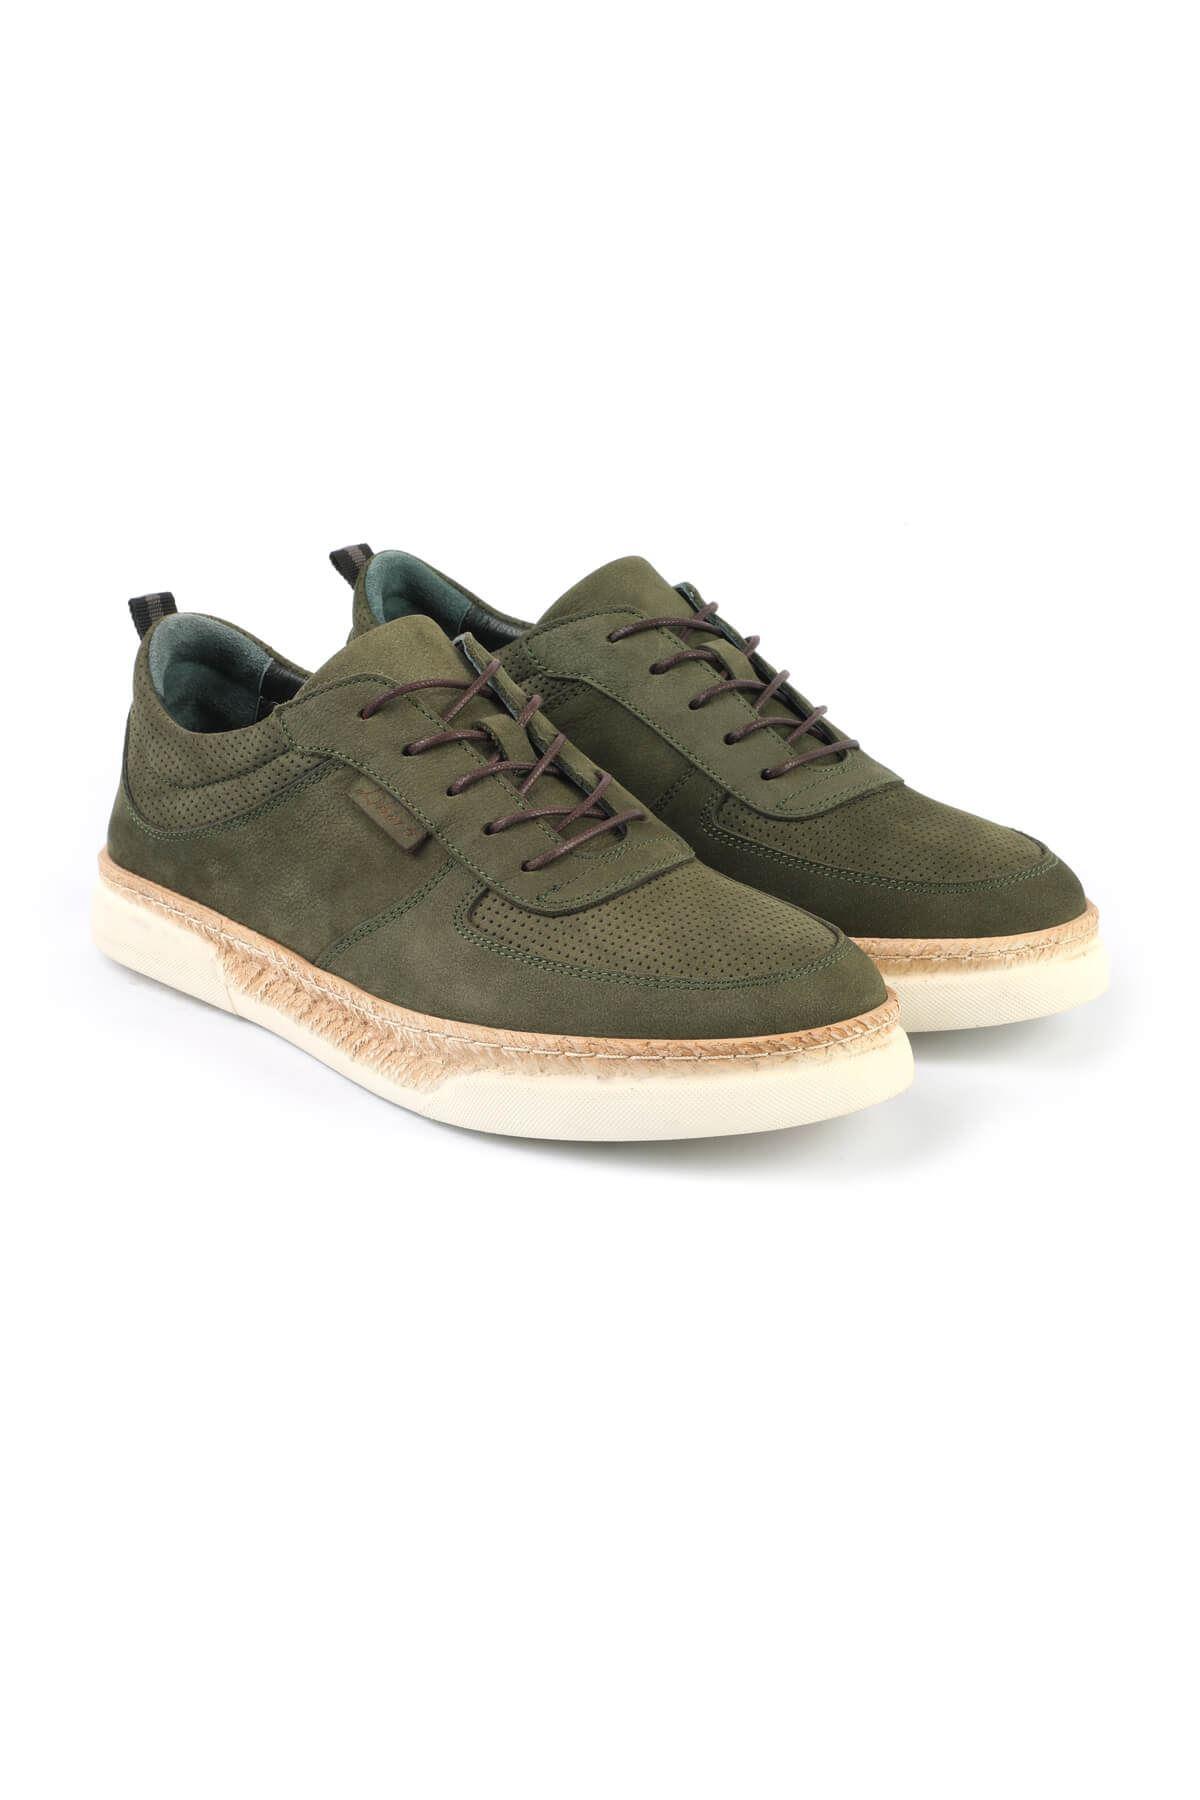 Libero 3007 Haki Casual Ayakkabı